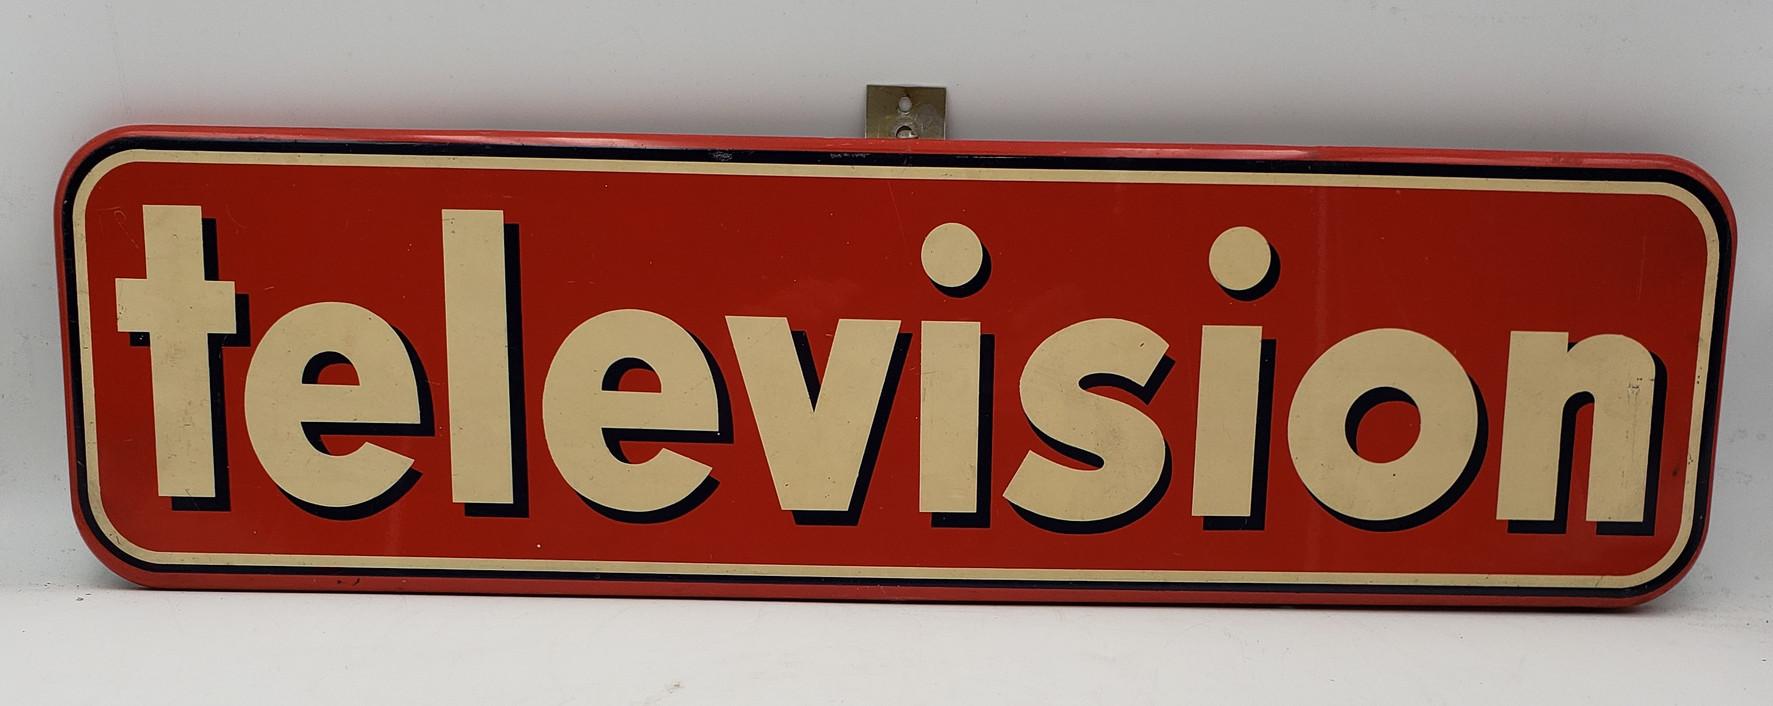 Vintage Television Enamel - Painted Metal Sign Advertisement 26 1/2 x7 1/2 1950s